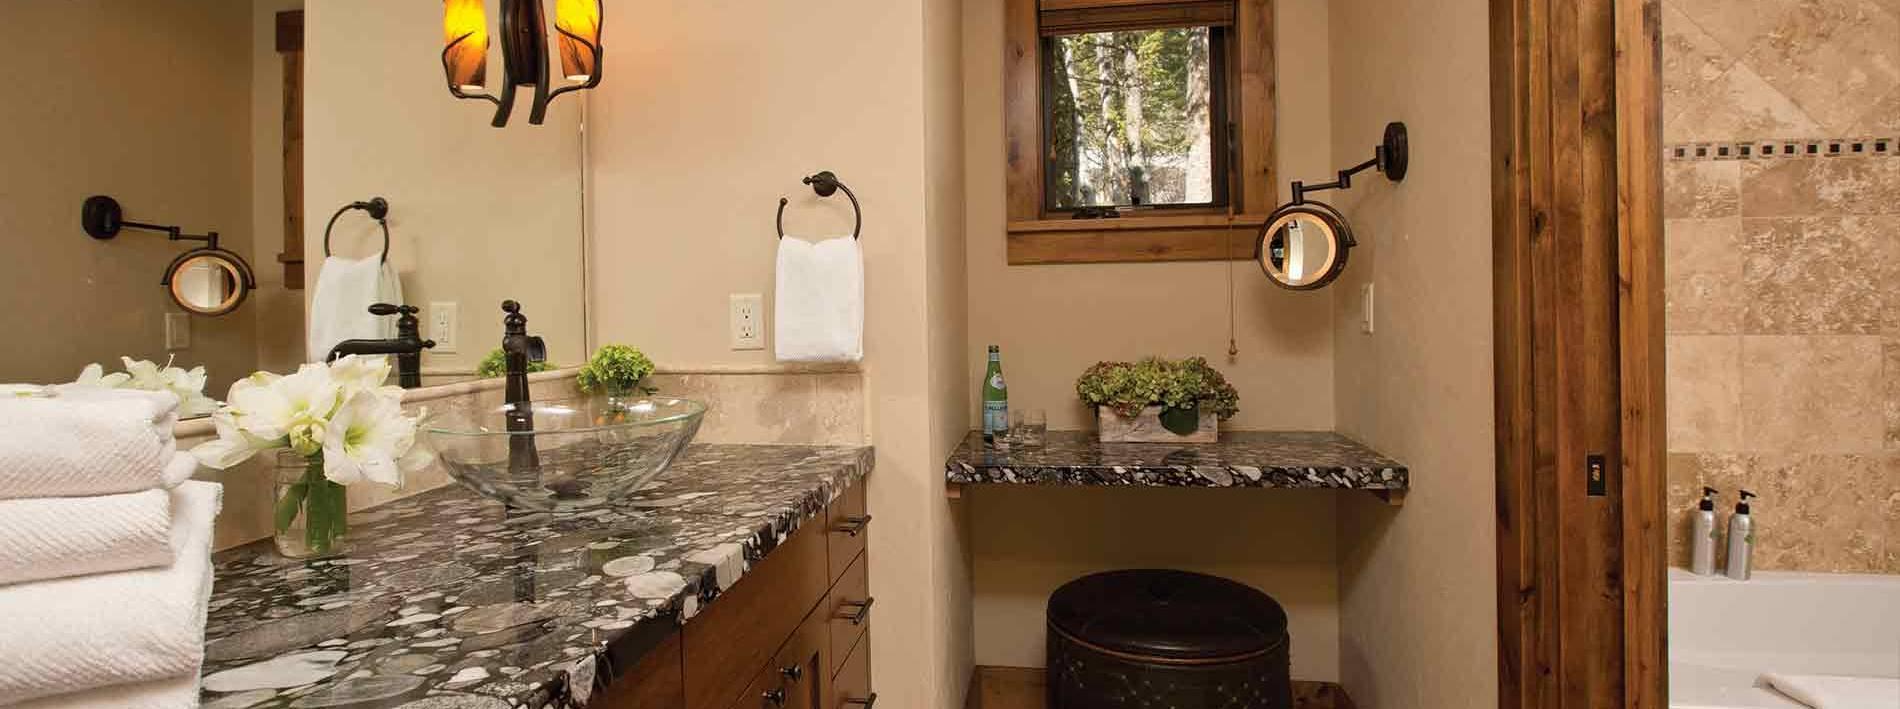 Luxury bathroom in the 6.5 bathroom Blue Moose Lodge